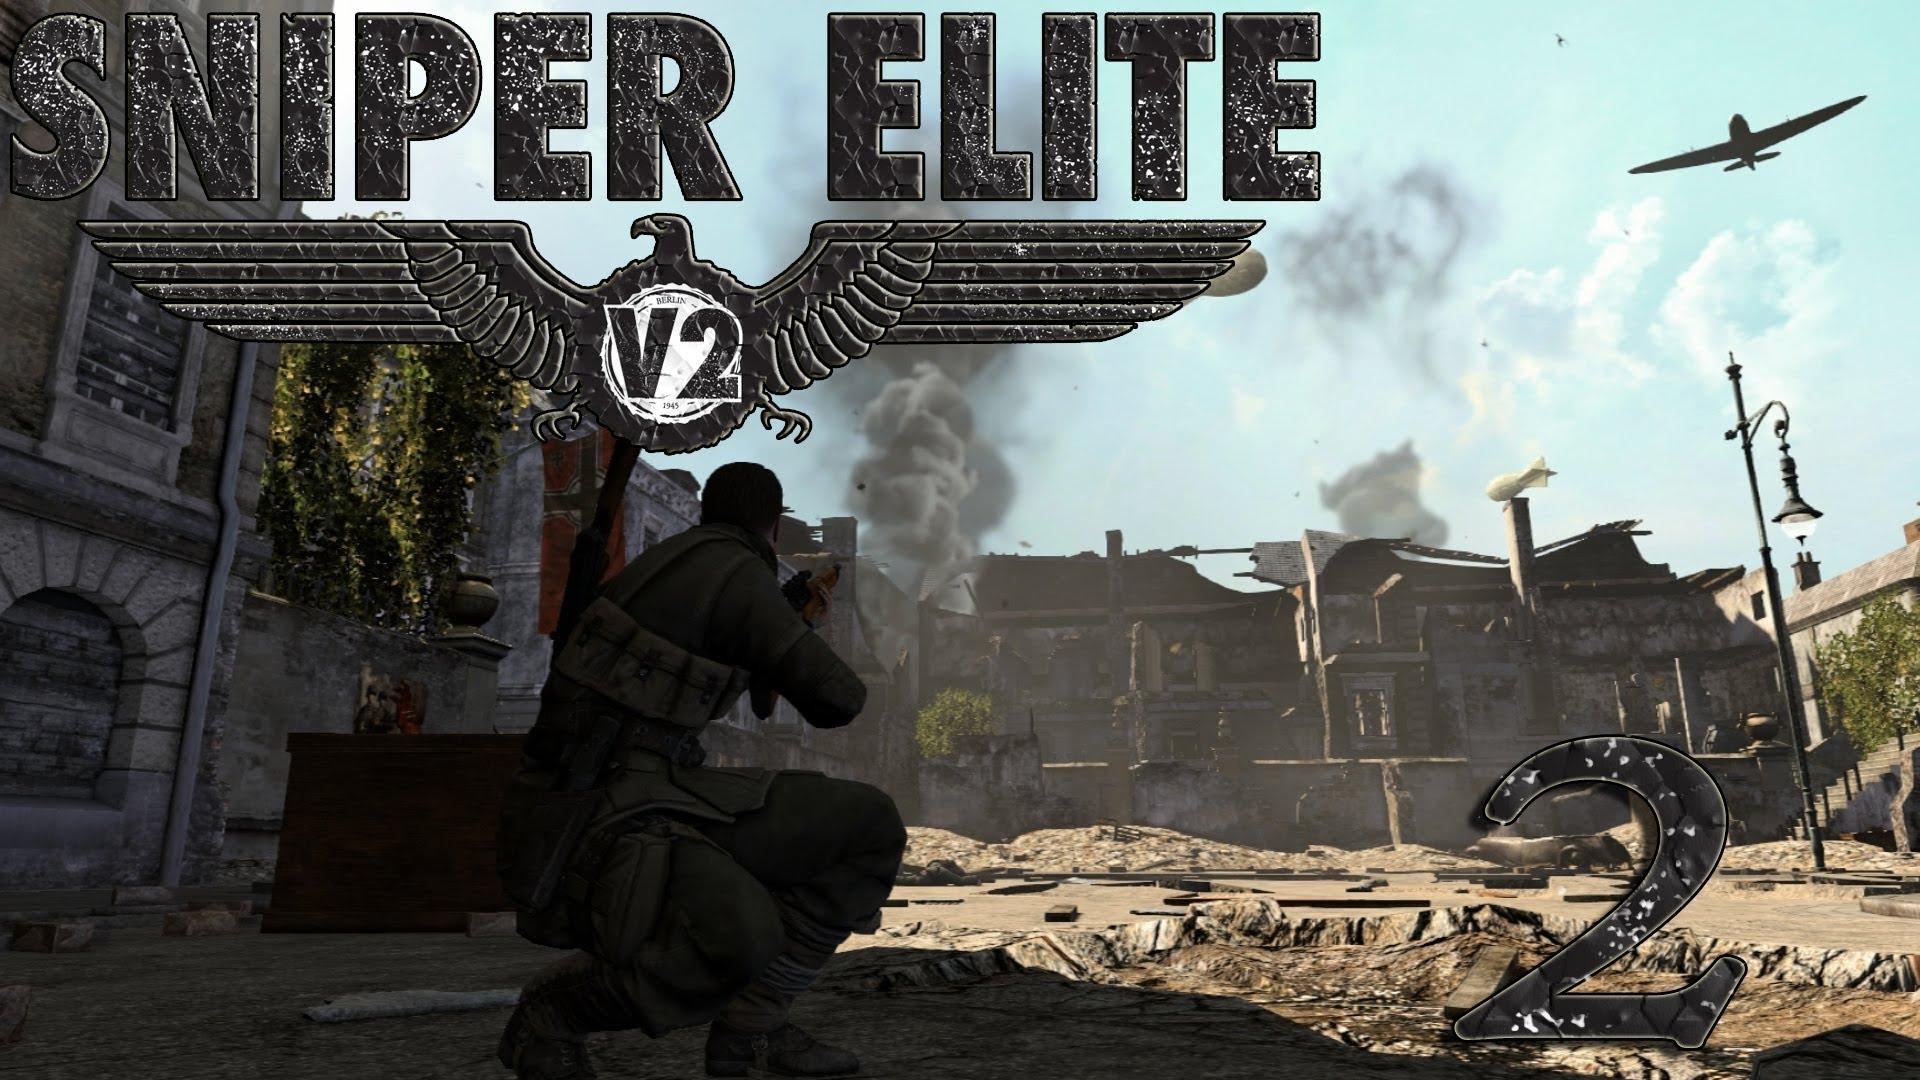 Sniper Elite V2 HD Wallpapers and Background Images   stmednet 1920x1080